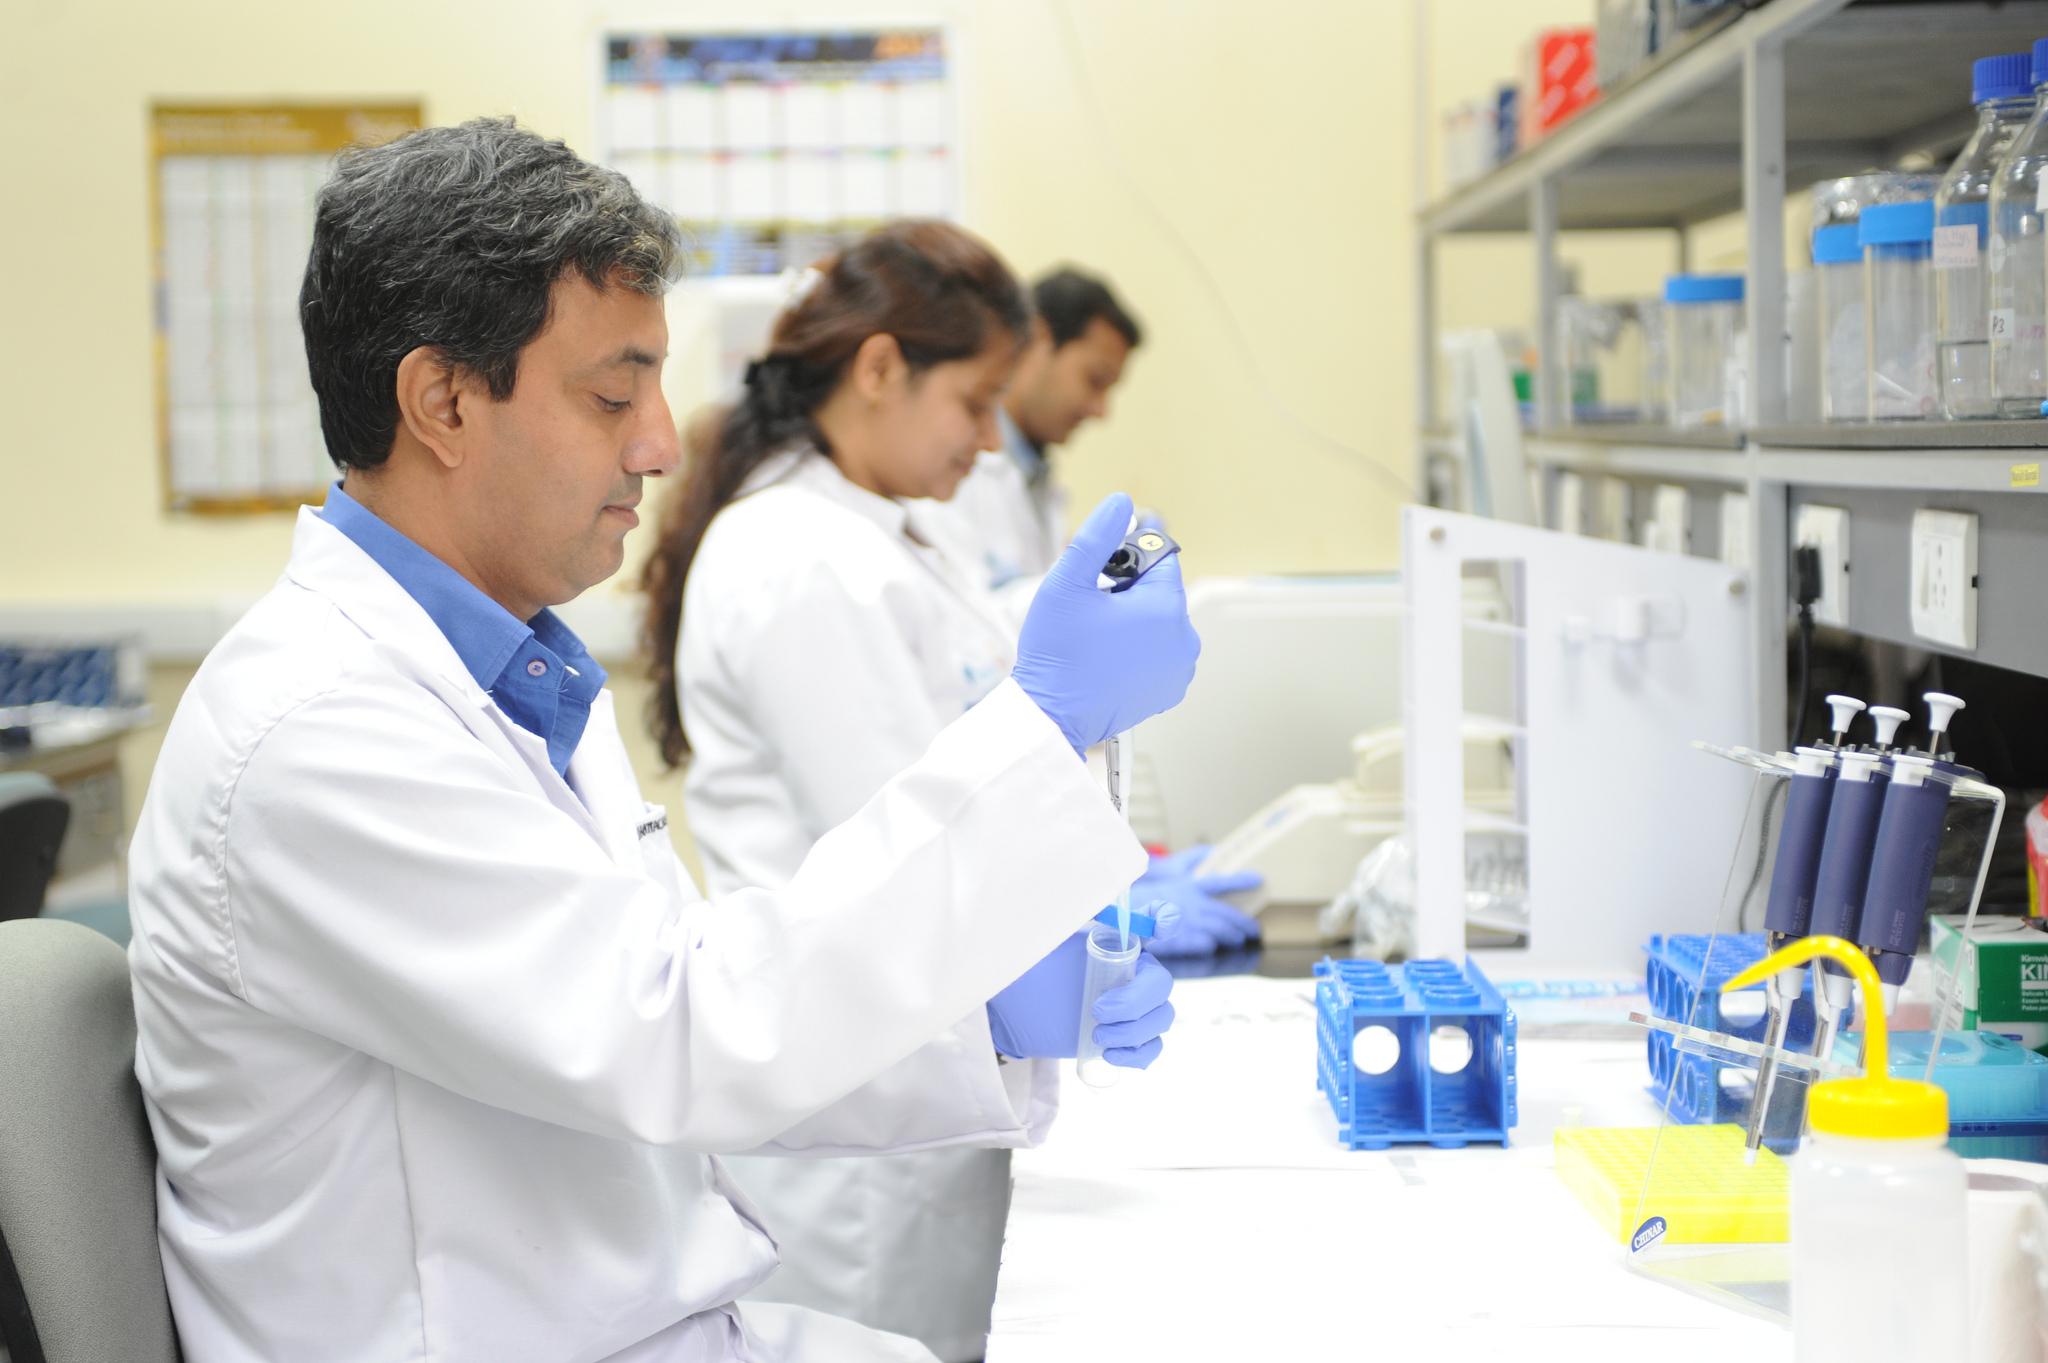 Microbiology Lab Test 1 Flashcards - Cram.com